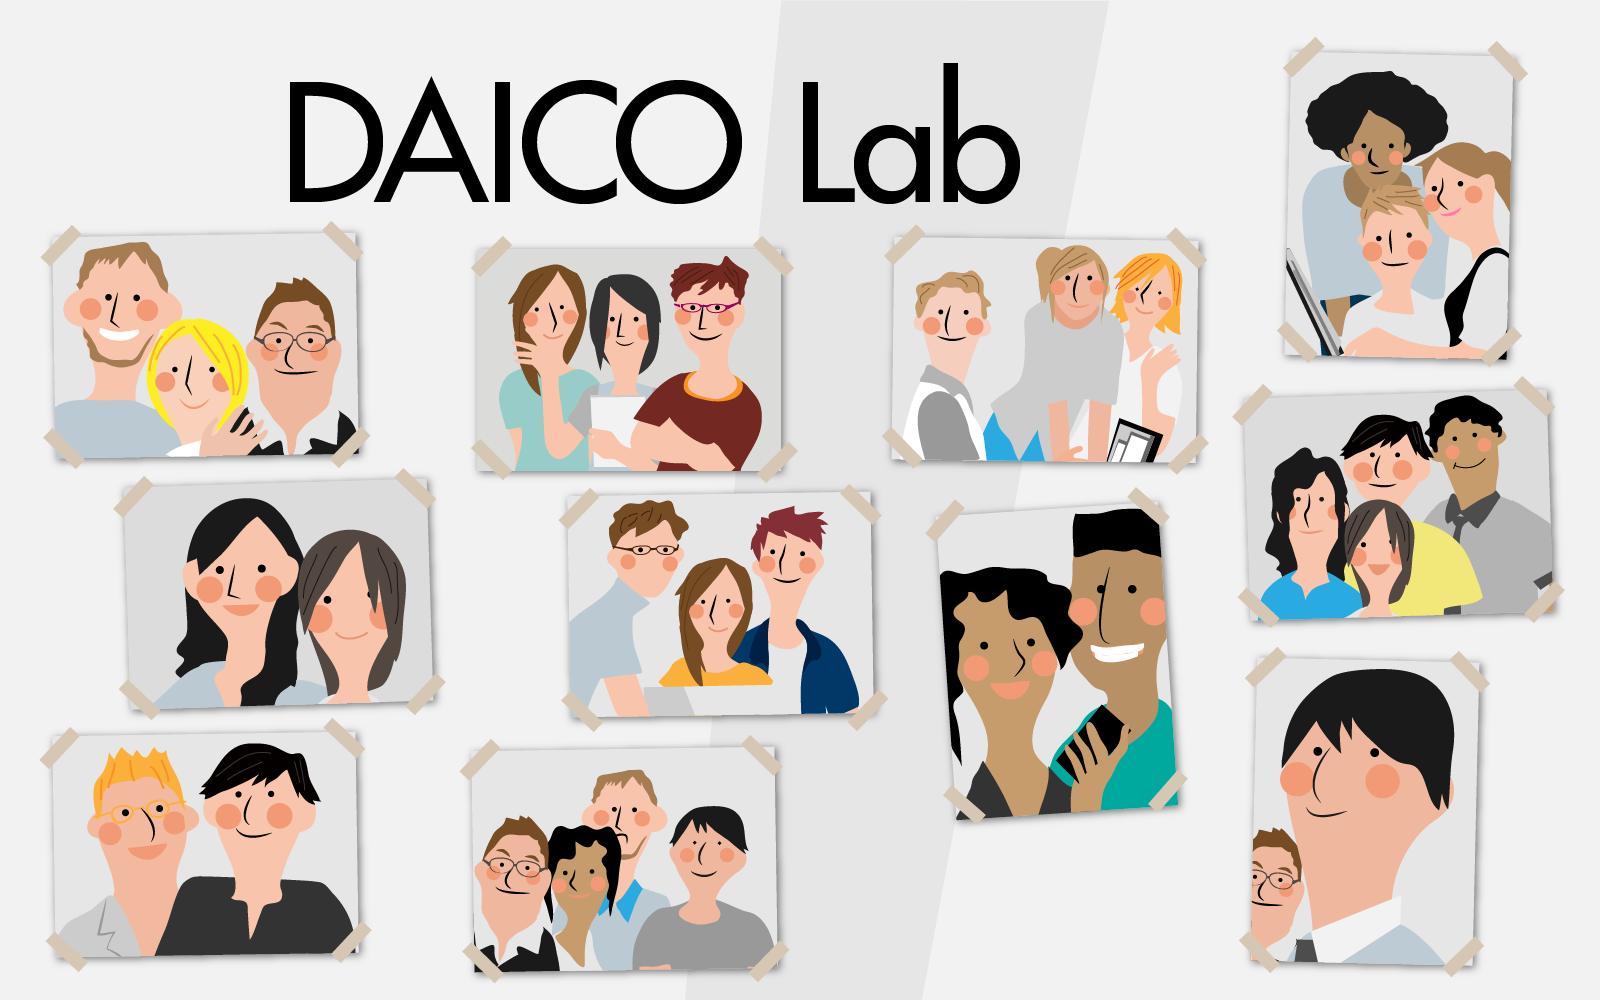 DAICOオープンソースフレームワーク #04 TokenController.solの実装